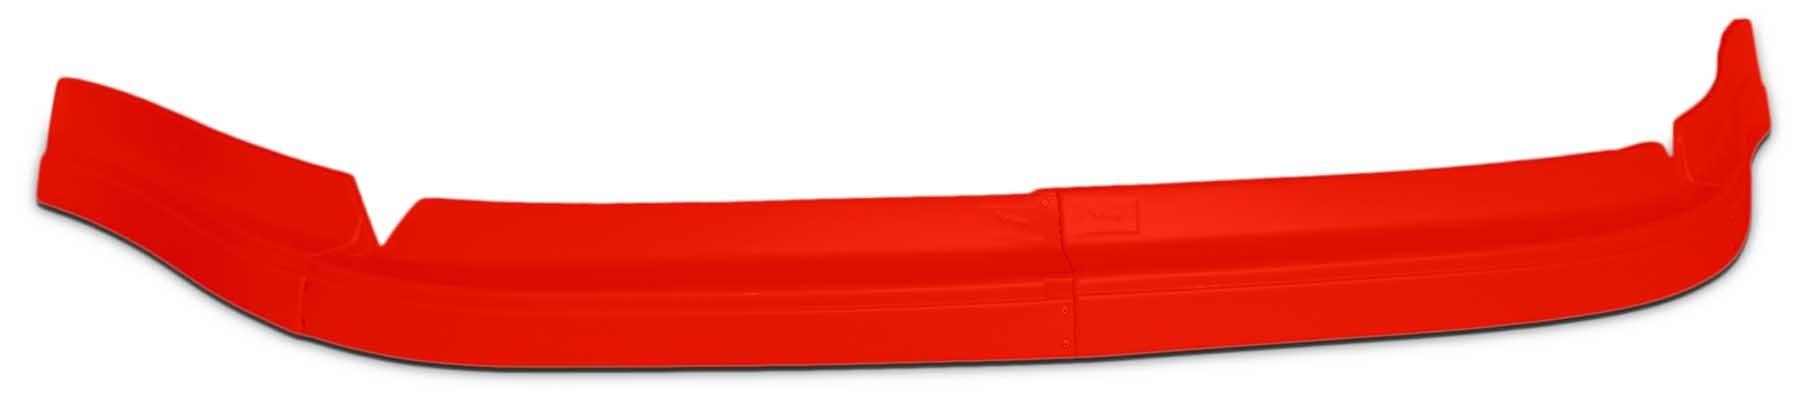 Fivestar Lower Air Valance MD3 Dirt Nose Flr Red